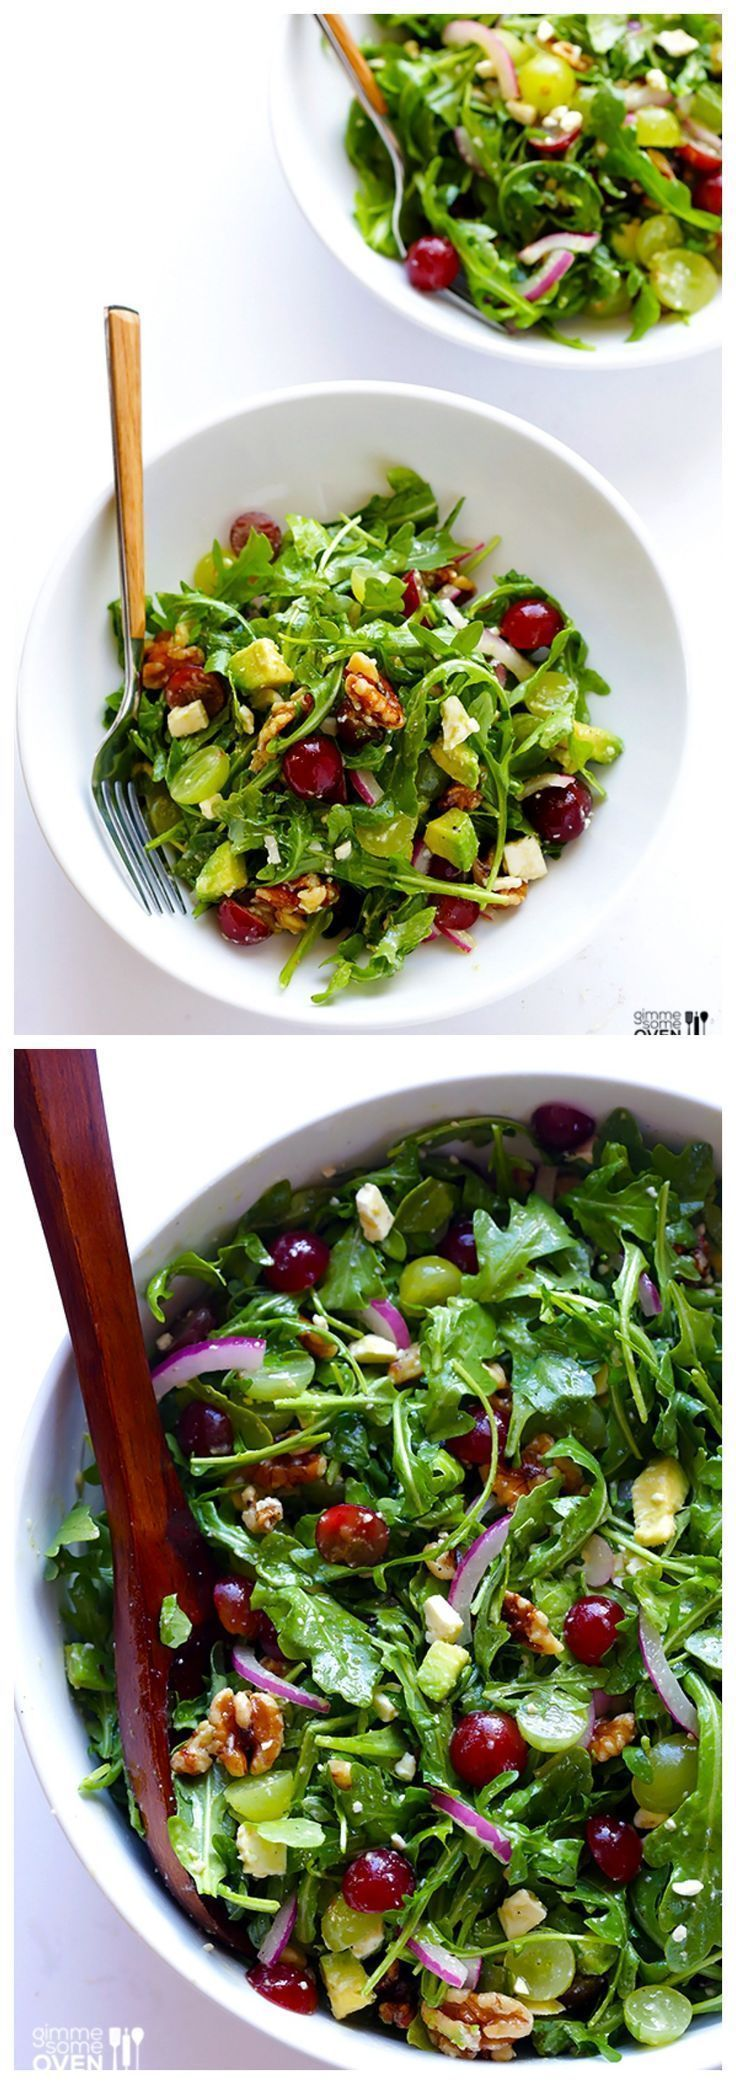 Grape, Avocado & Arugula Salad -- This Simple Salad is Fresh, Light, and Full of Wonderful Sweet Flavors You'll Love #healthy #salad #recipes